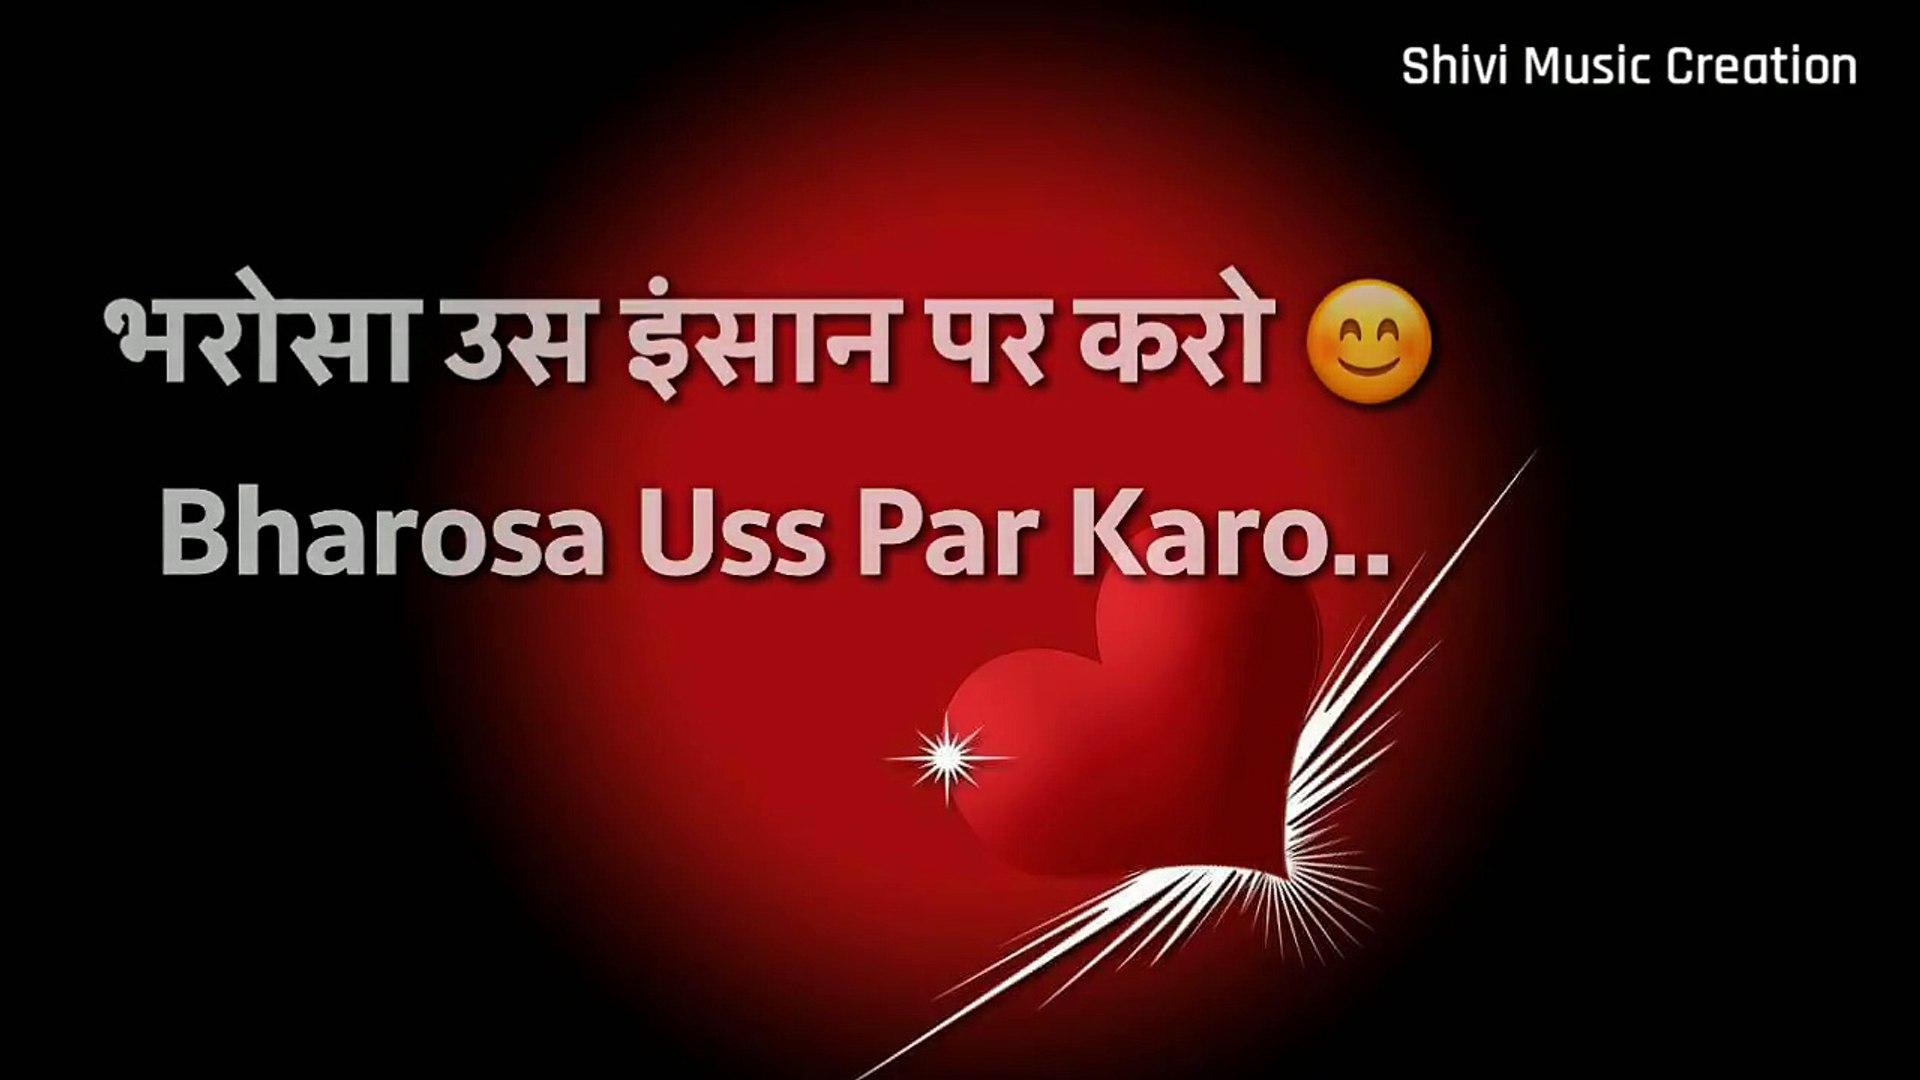 Very Sad WhatsApp Status Videos Sad Heart  Touching Line WhatsApp Status Lovely Status 2018, whatsap